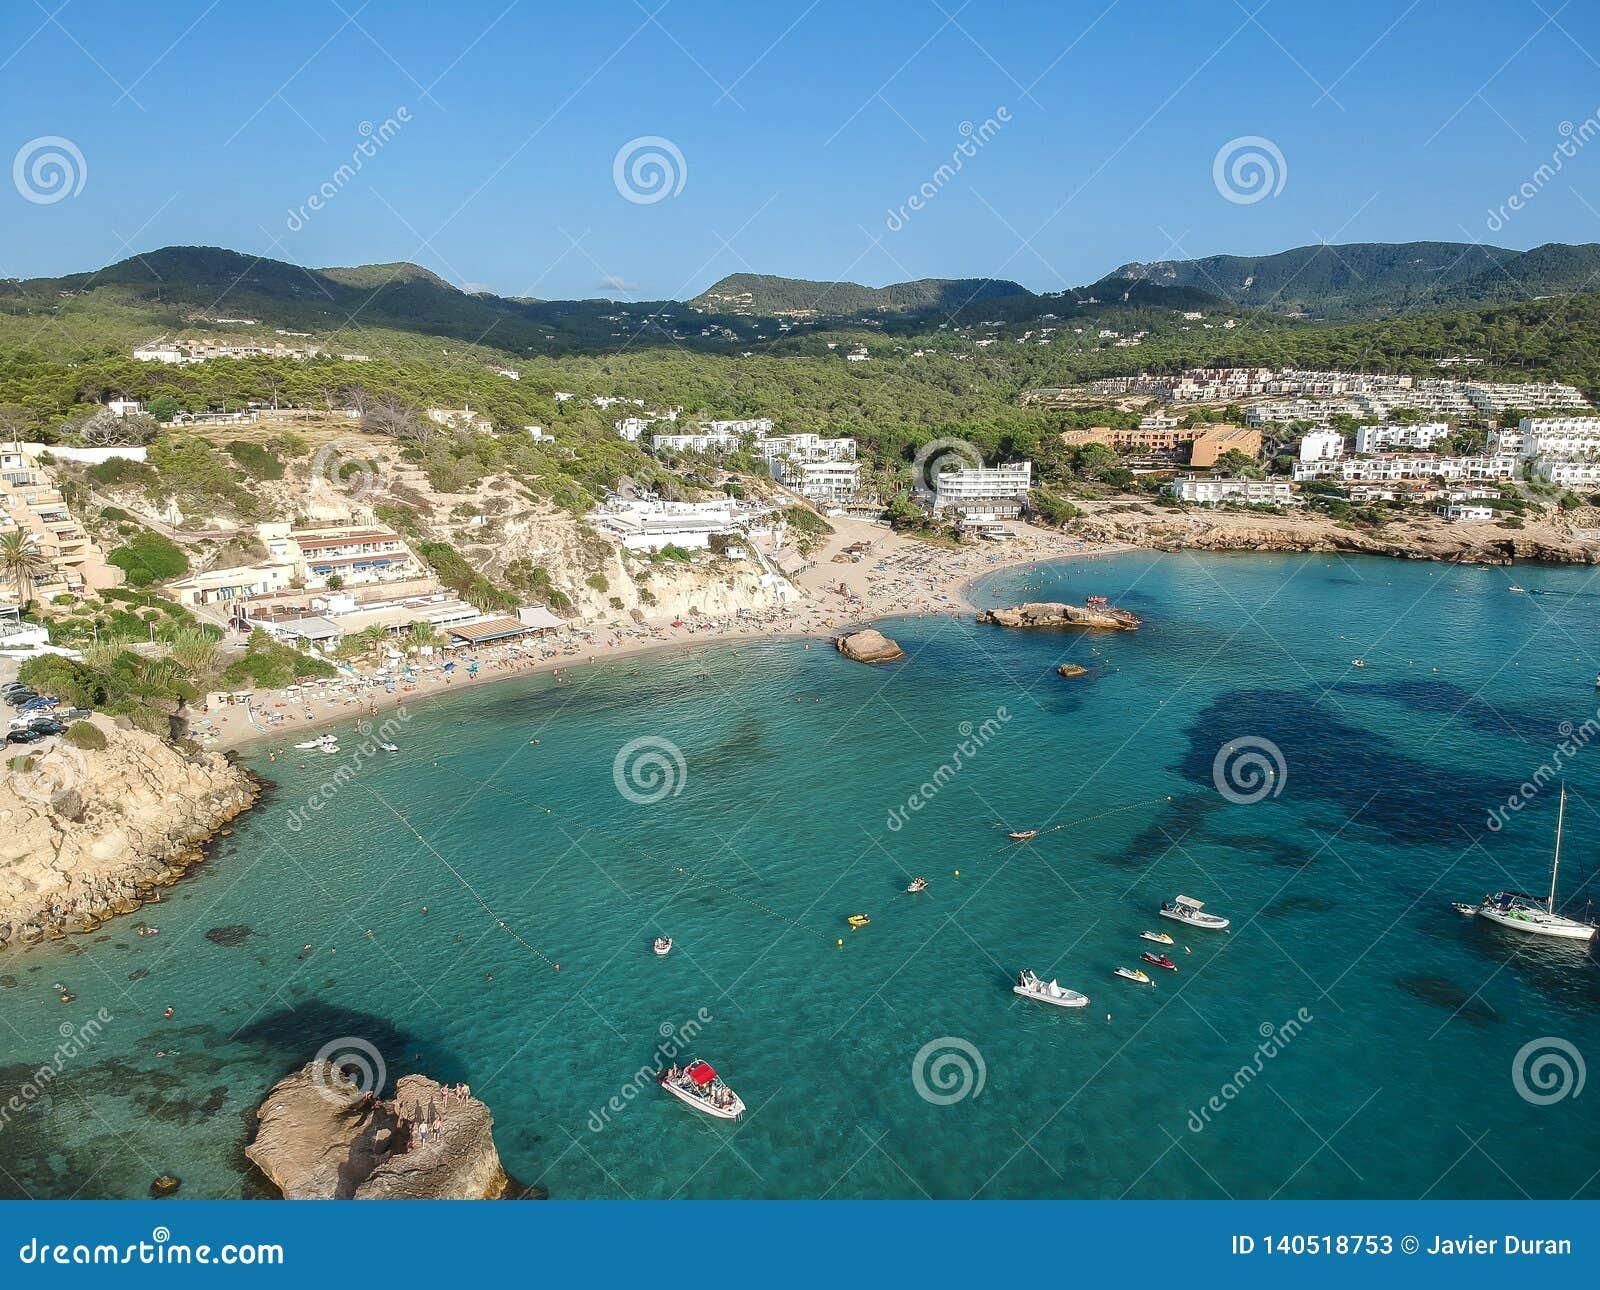 Aerial View Of Cala Tarida, Ibiza, Spain  Stock Image